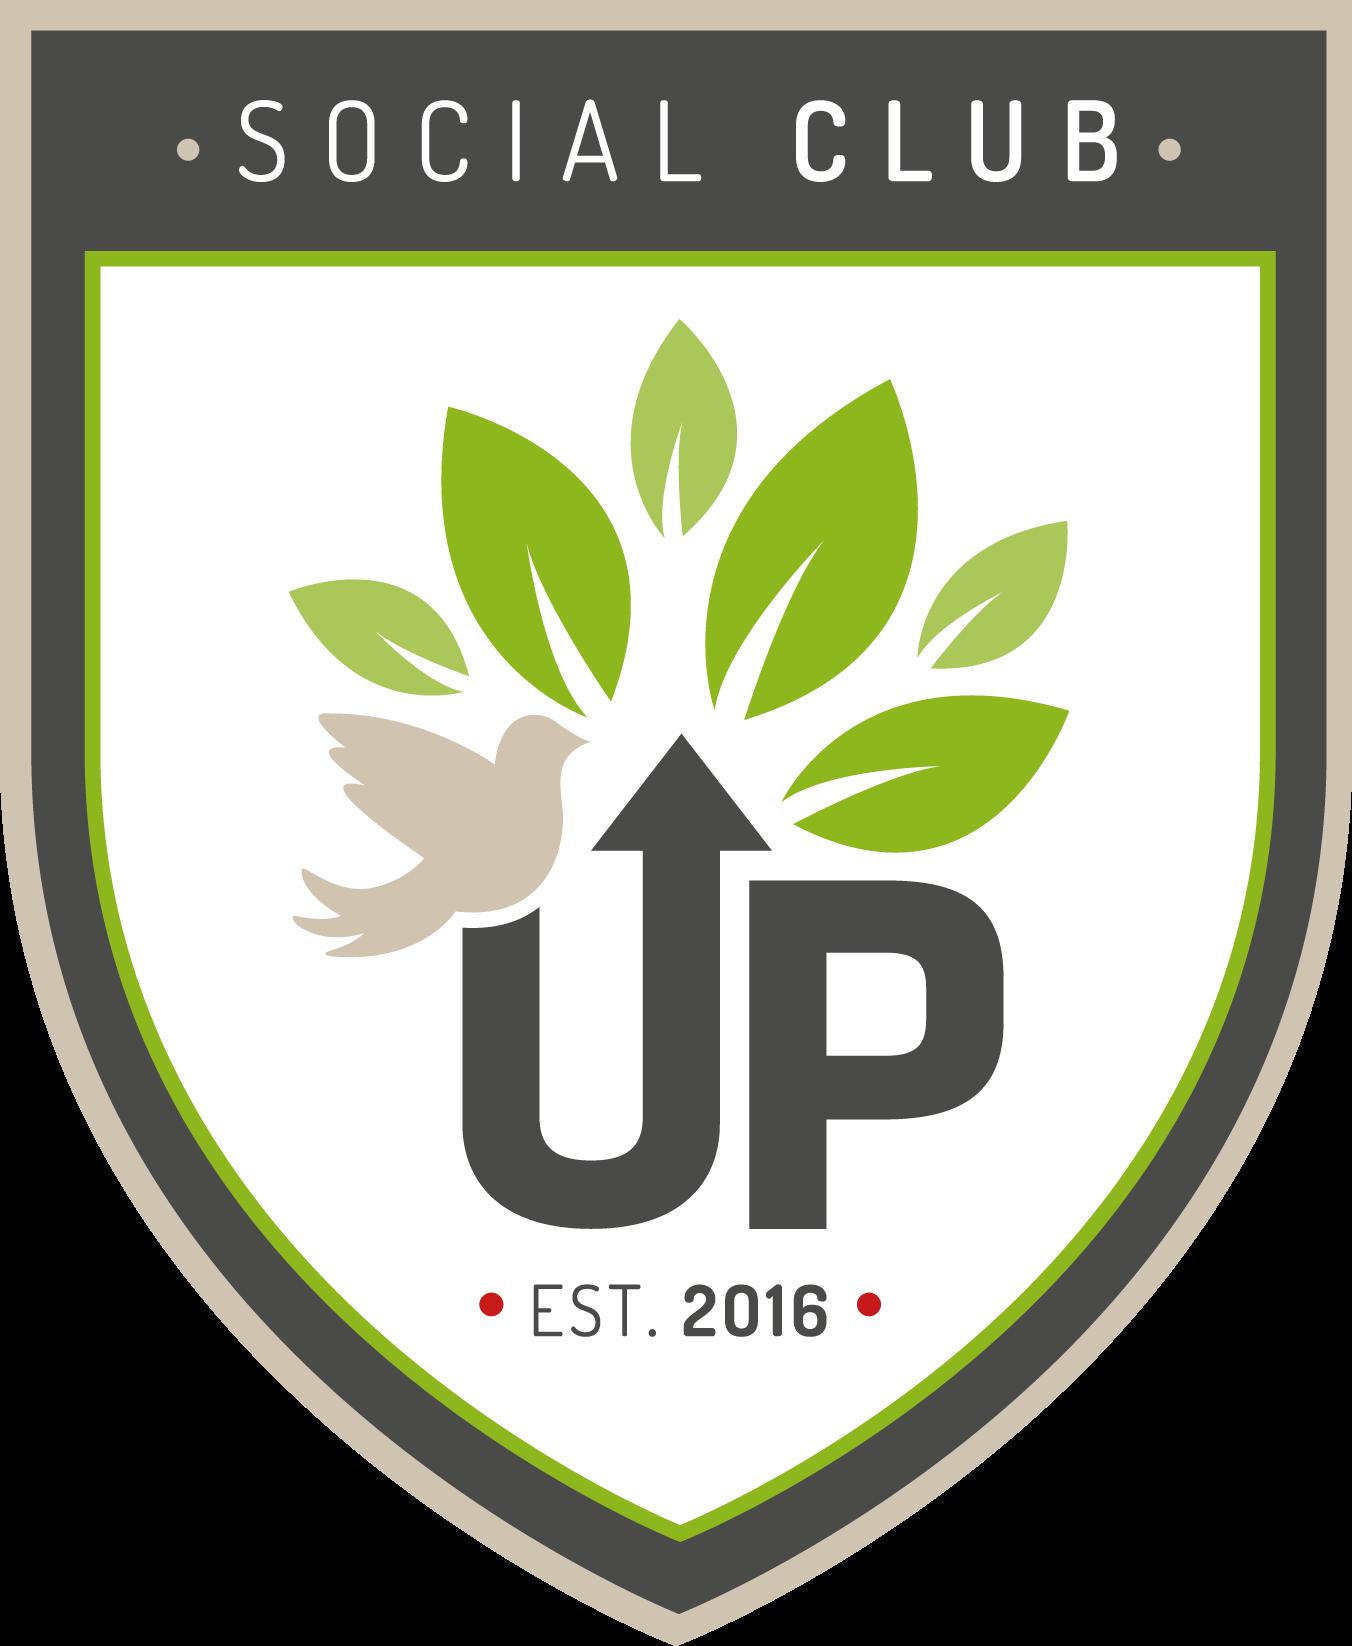 Up Social Club